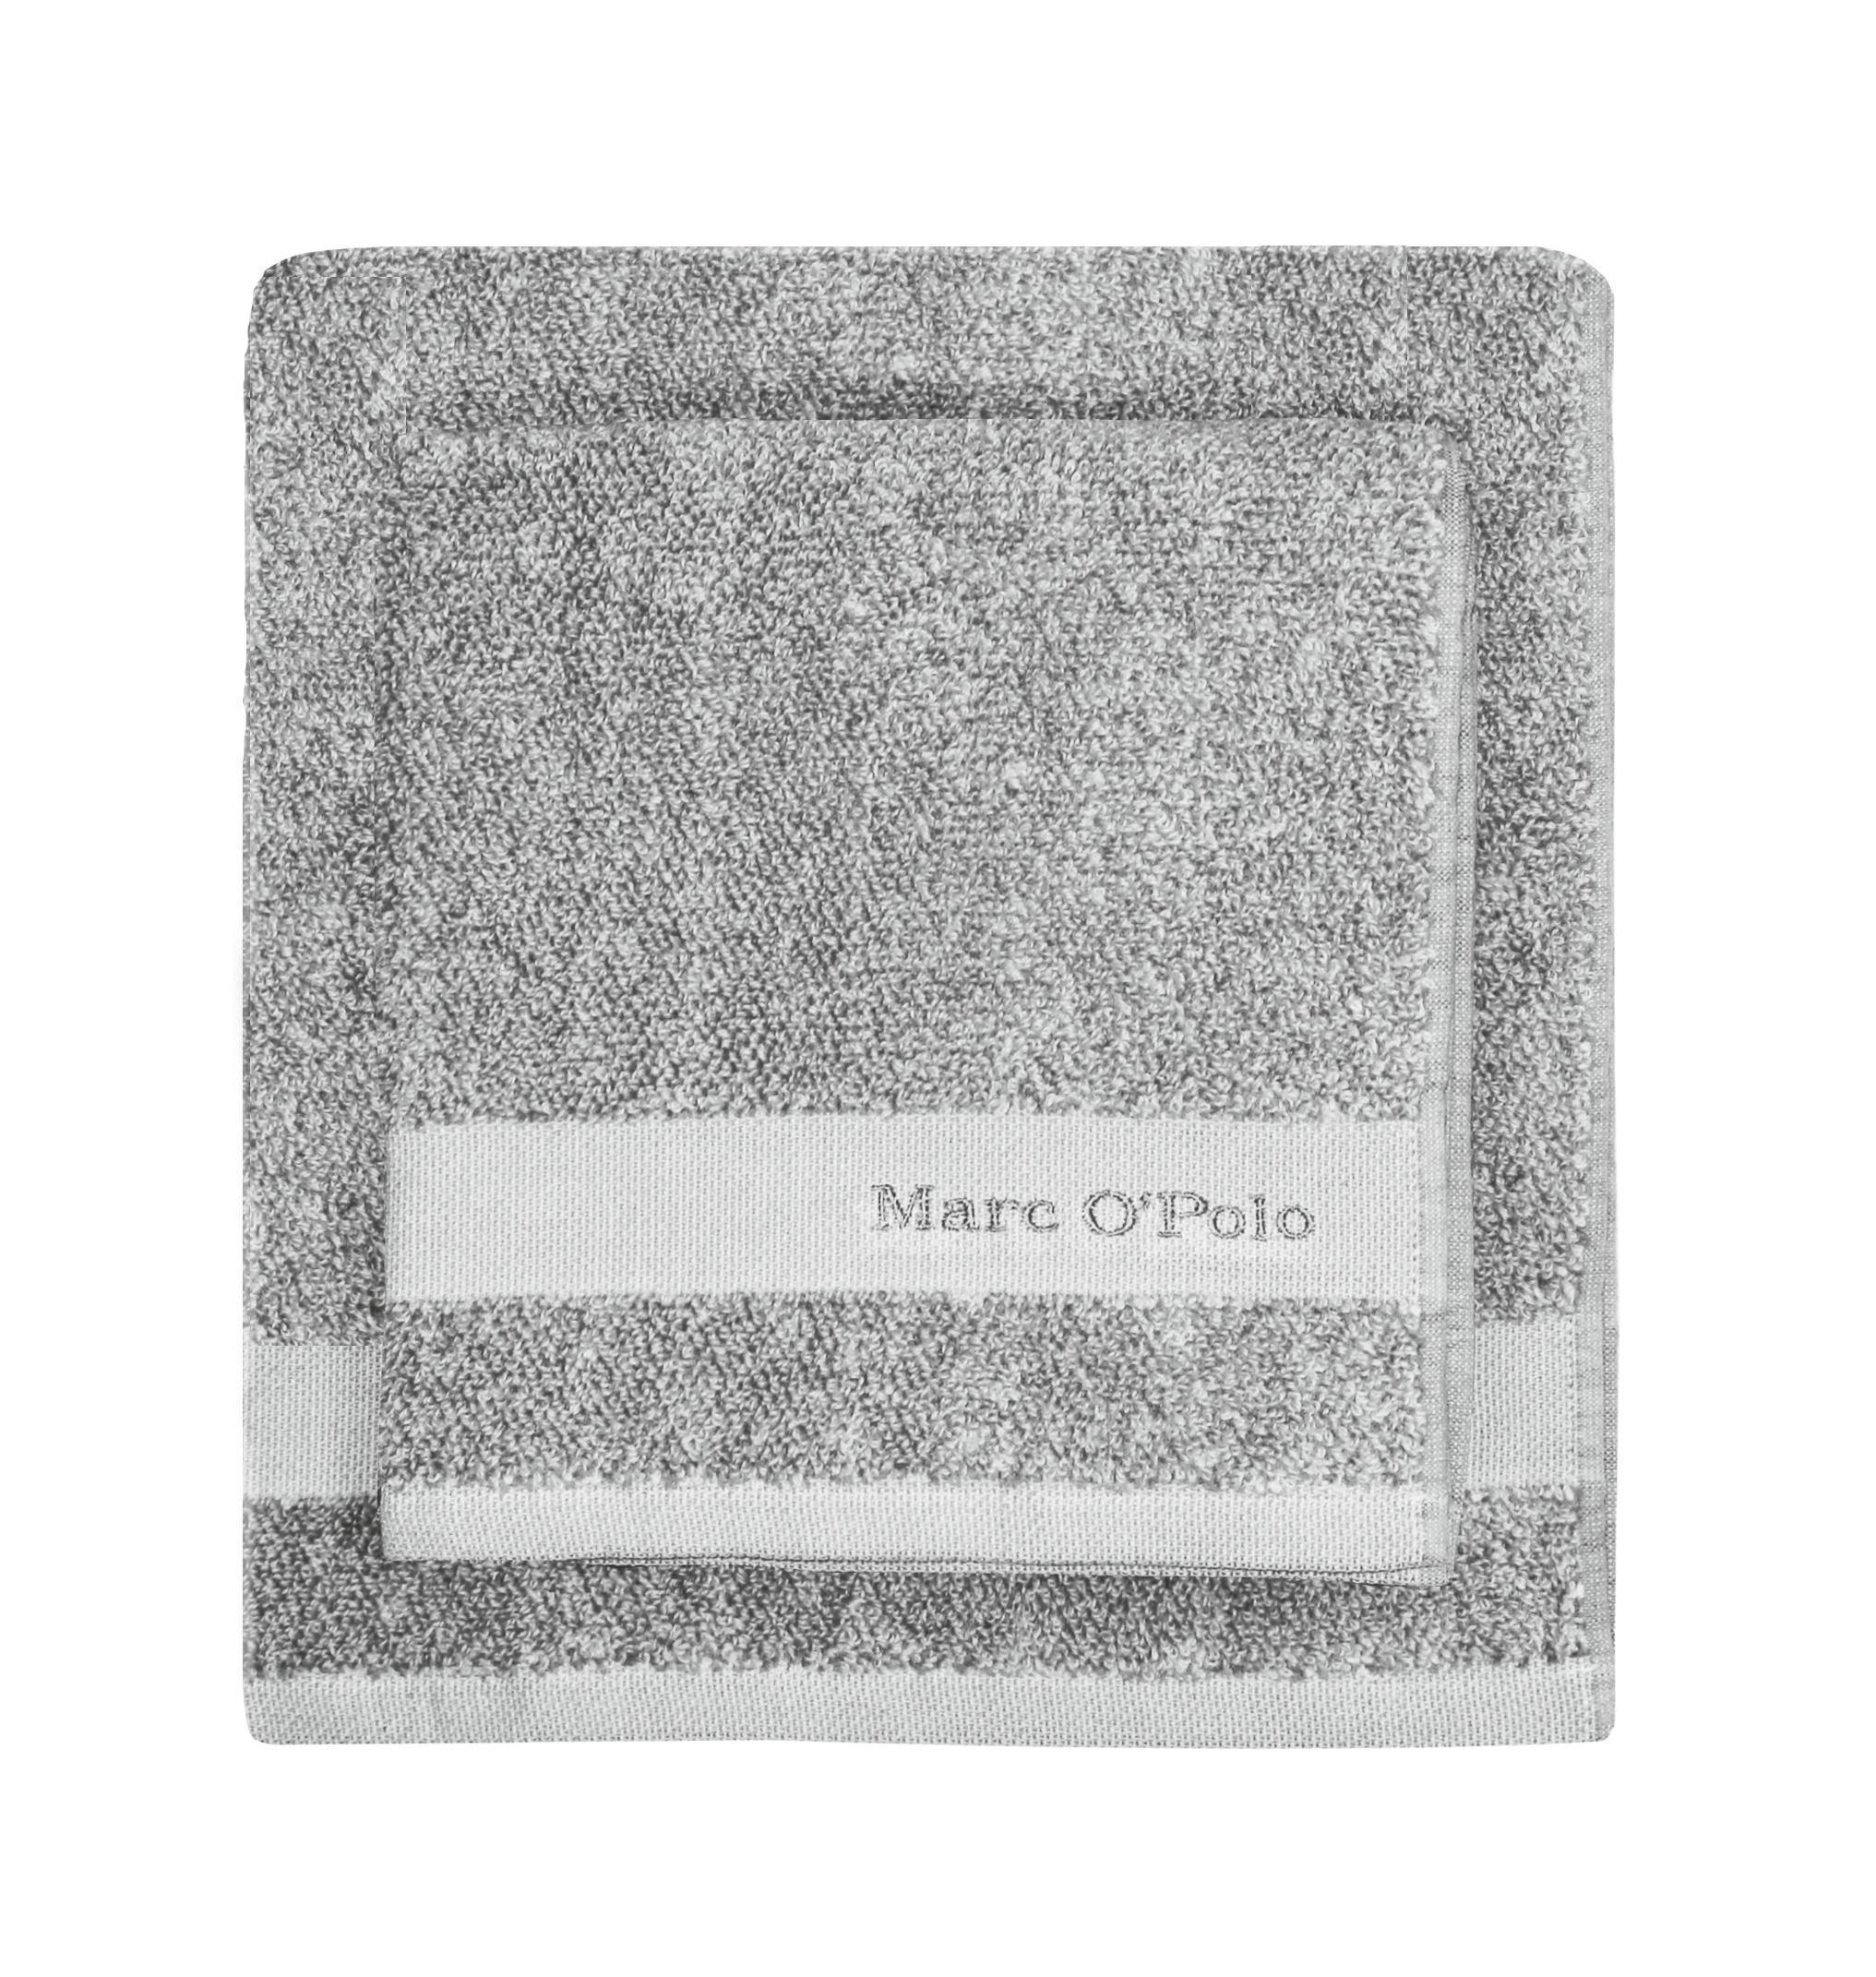 BRISAČA MELANGE, 50/100 - siva, Konvencionalno, tekstil (50/100cm) - ESSENZA